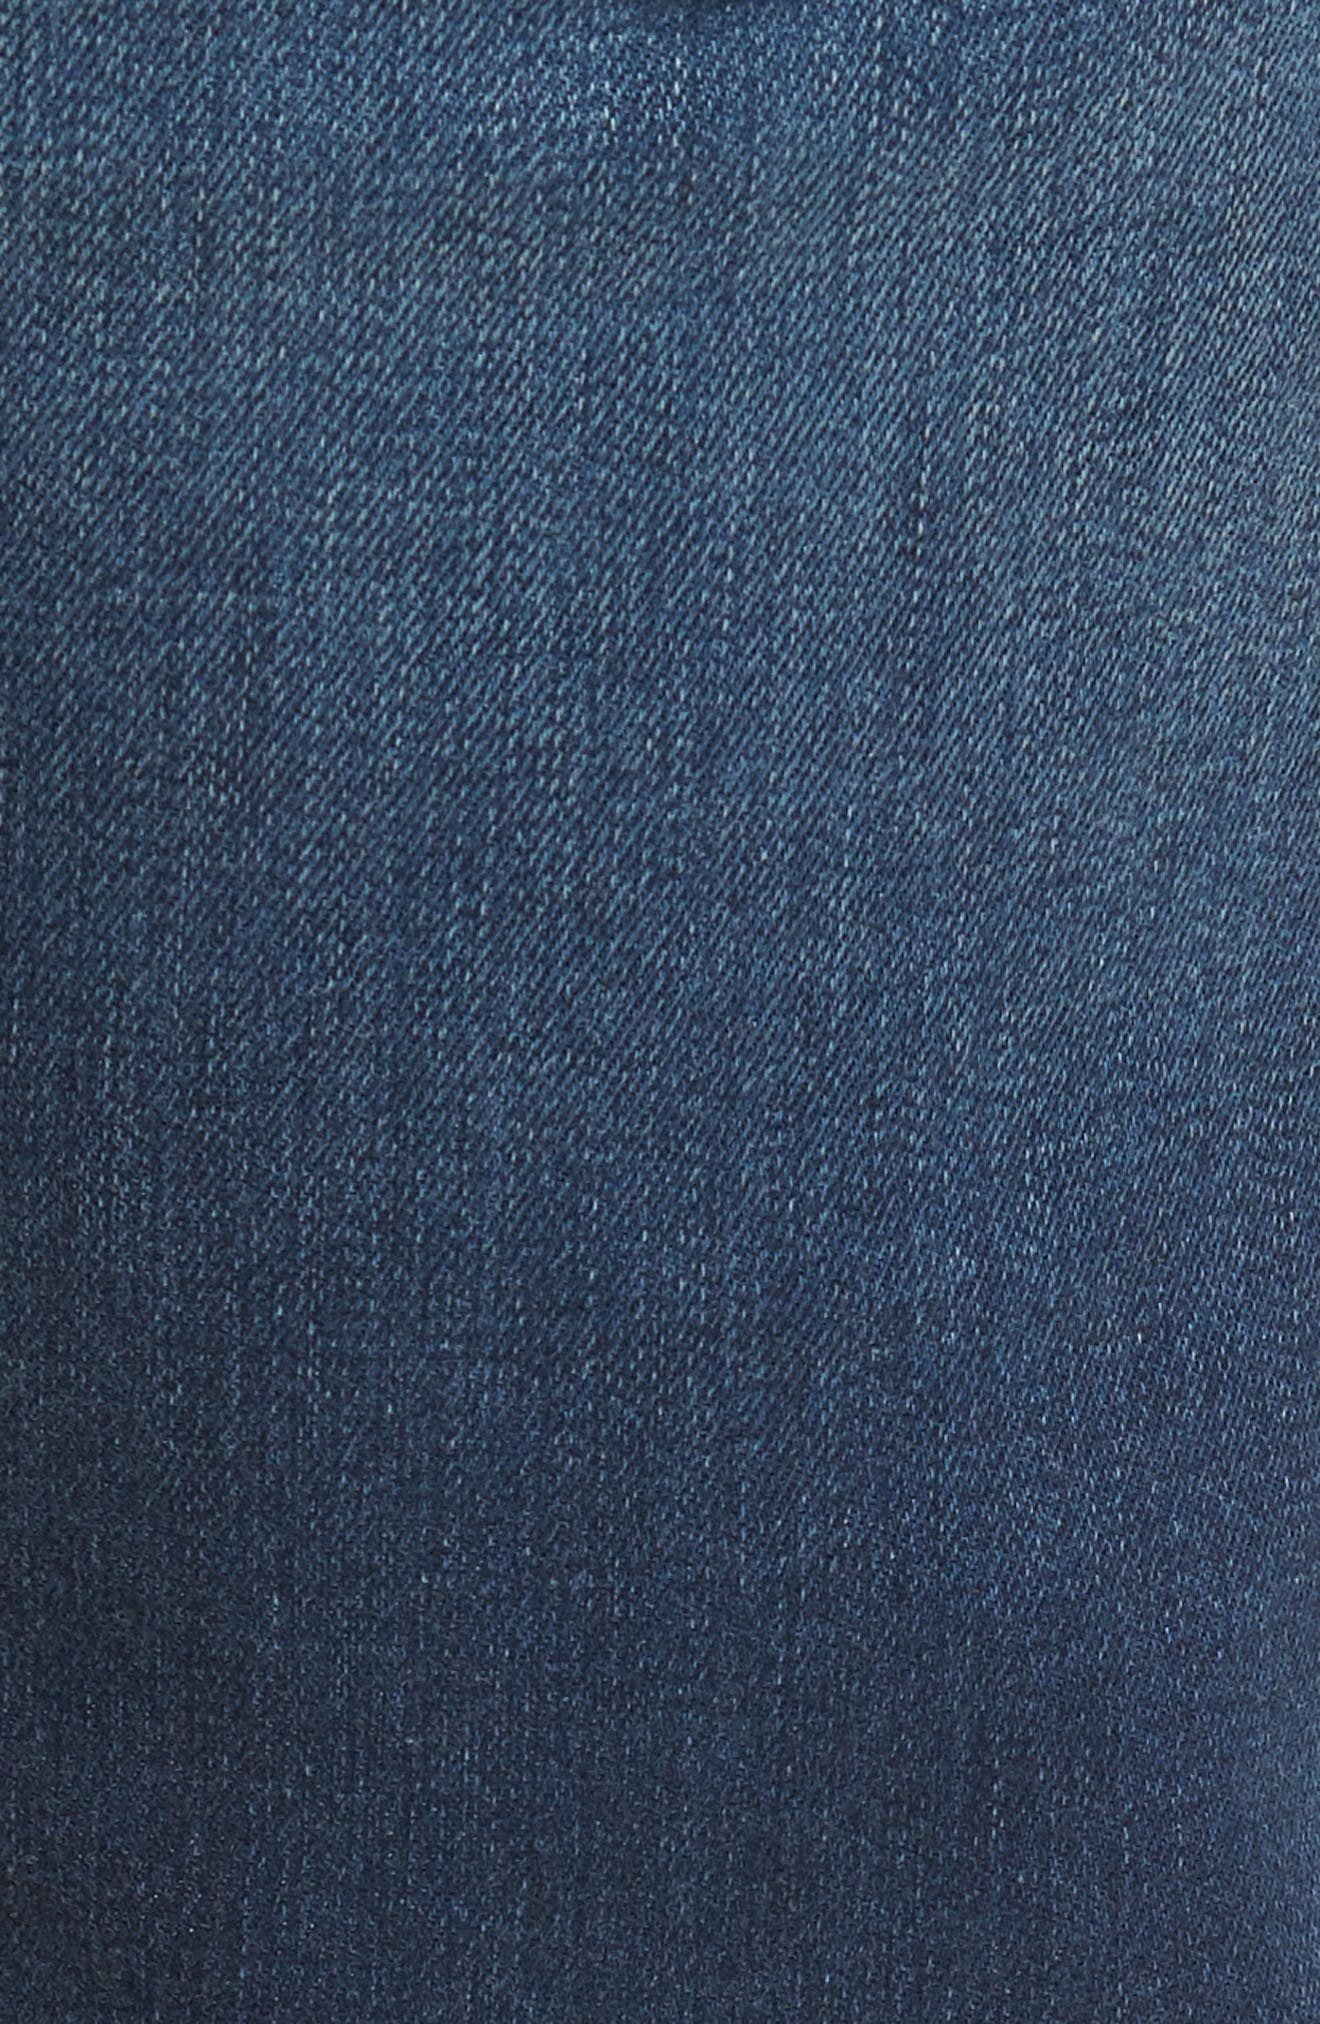 Geno Straight Leg Jeans,                             Alternate thumbnail 5, color,                             Indigo Lake